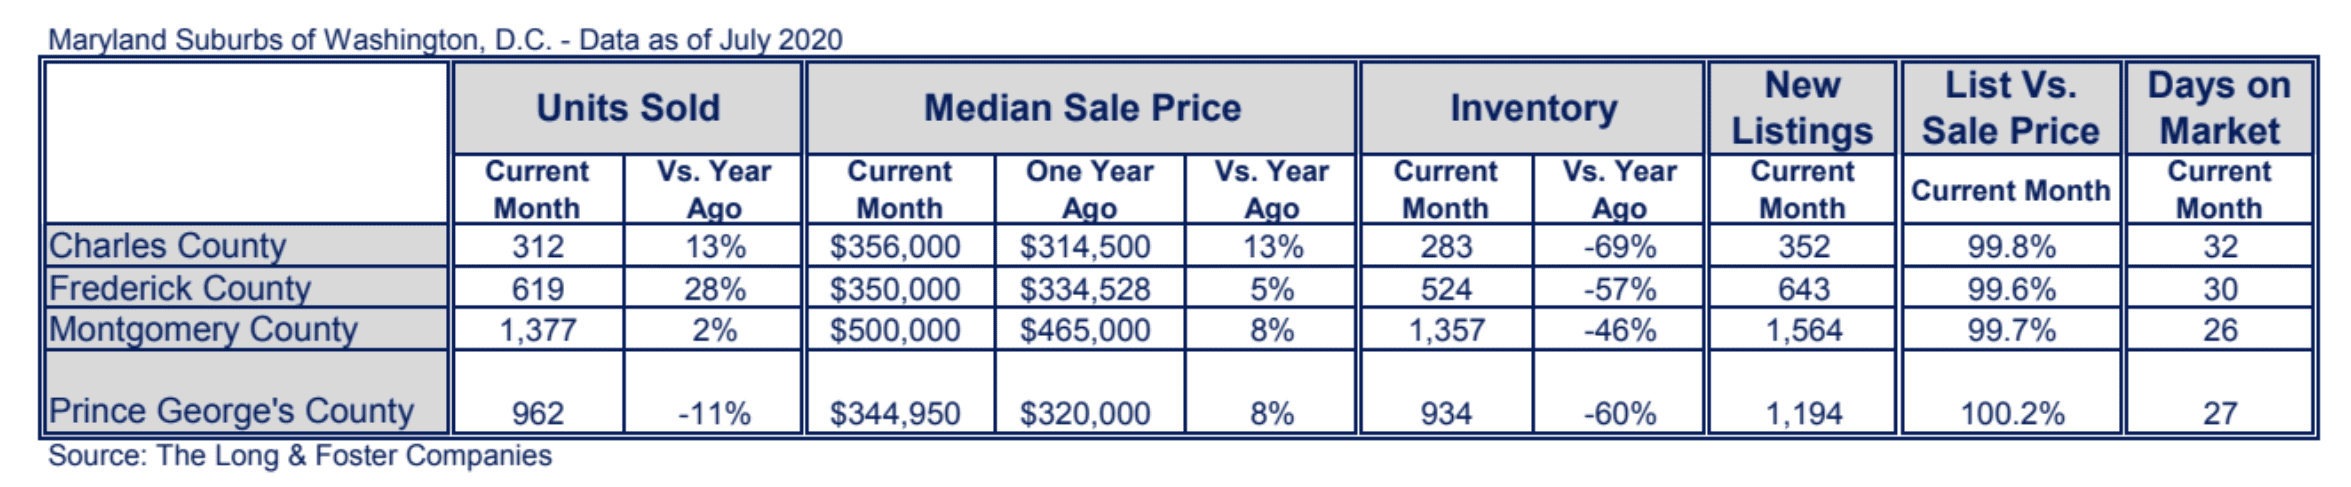 Maryland Suburbs Market Minute Chart July 2020